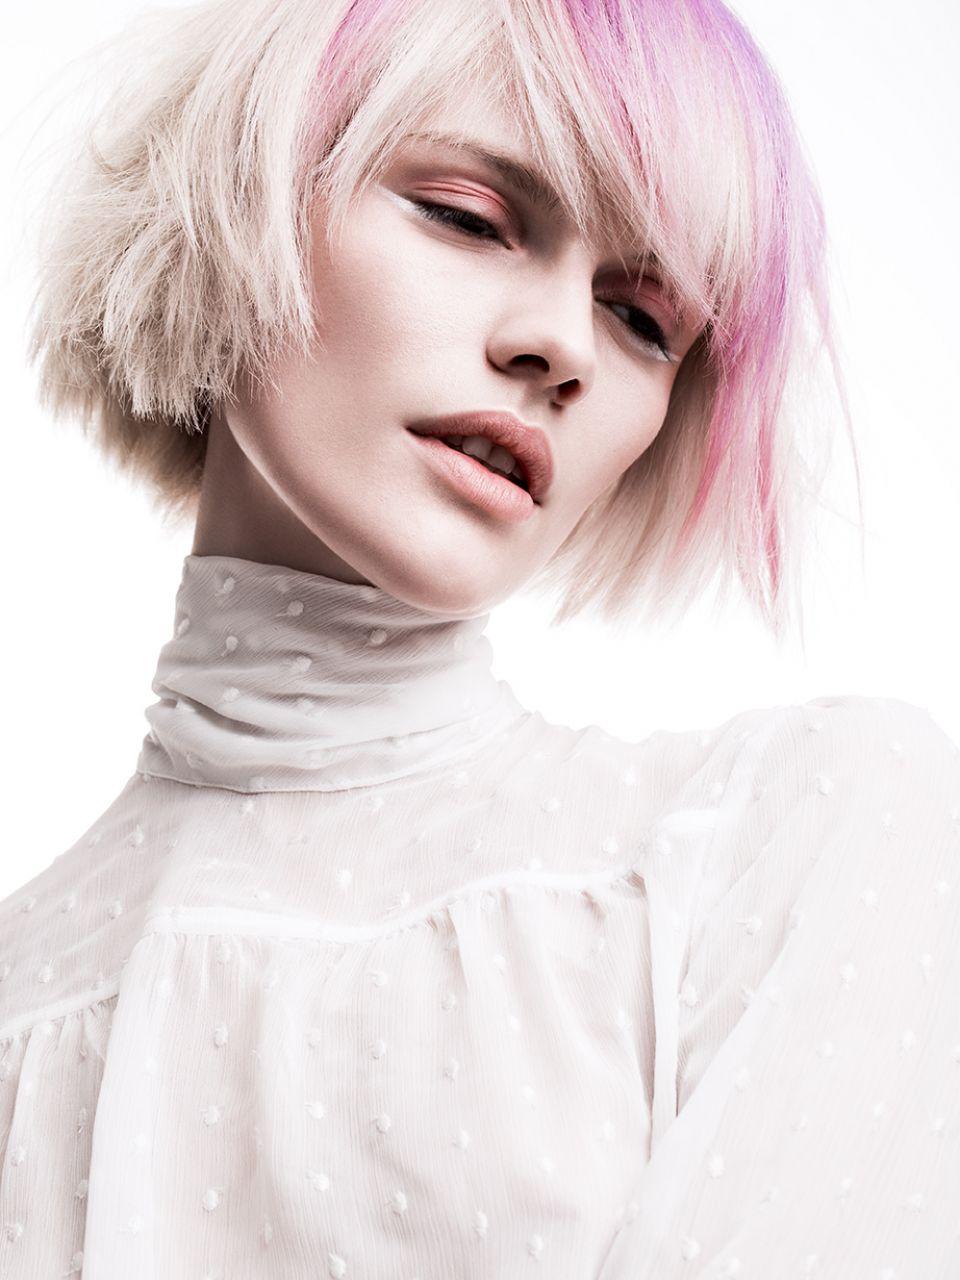 Haarfarben Trends   Unsere Top 20 im Juni 2021   Friseur.com